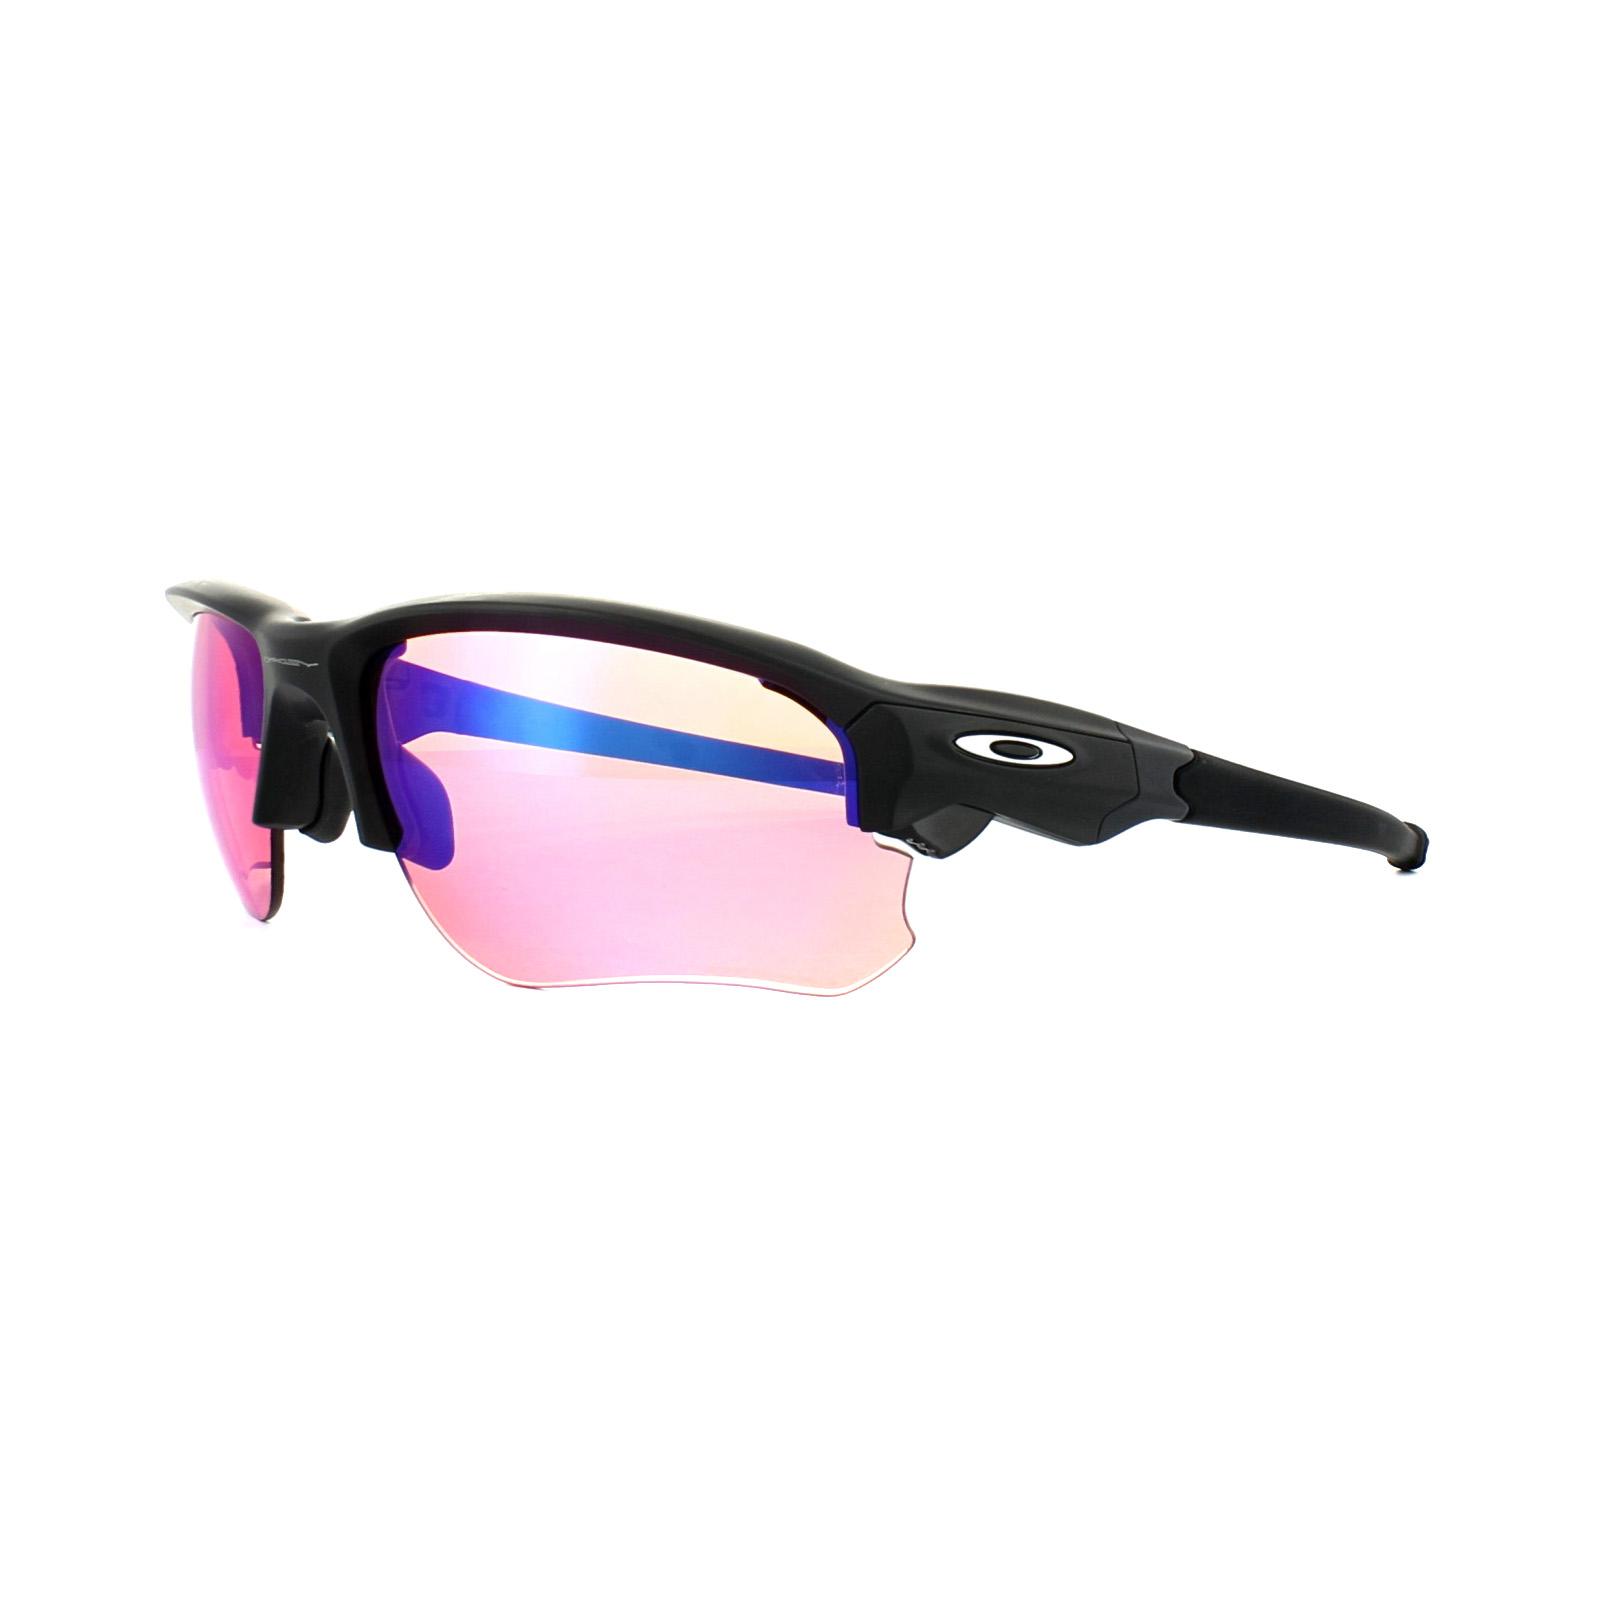 1758b6ccee7 Cheap Oakley Flak Draft Sunglasses - Discounted Sunglasses